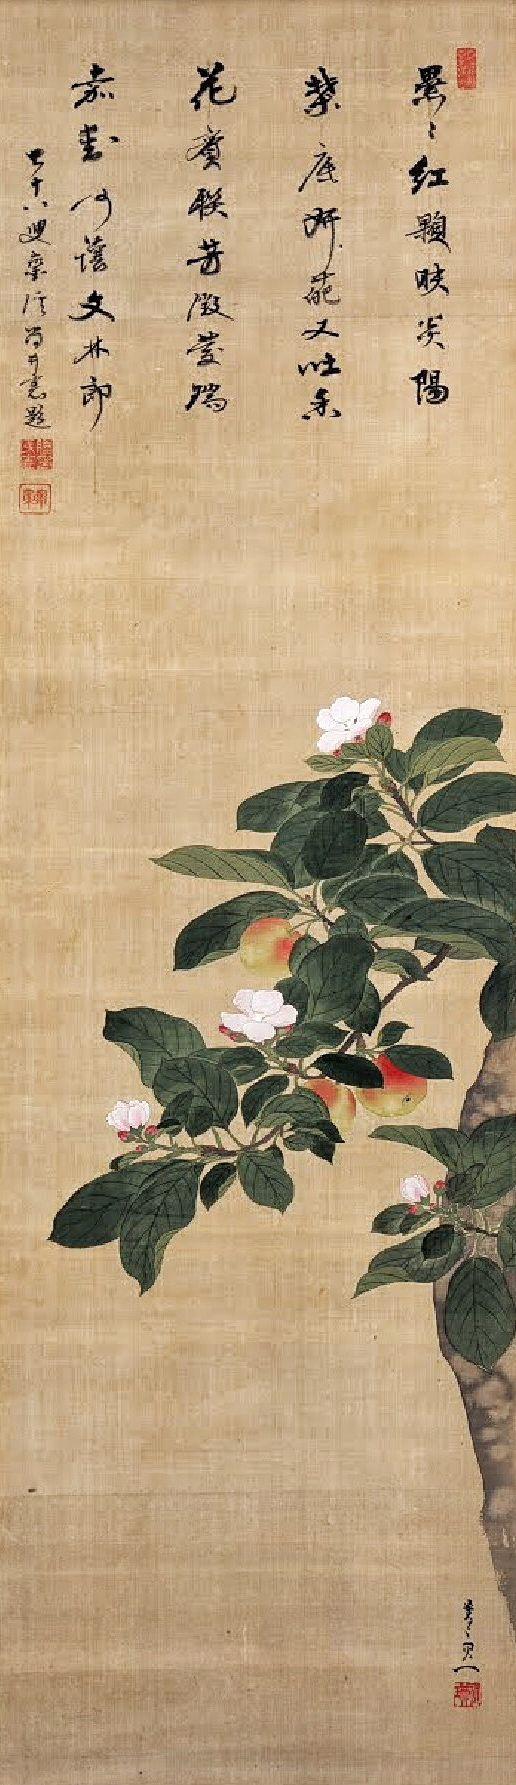 Apple Tree. Japanese hanging scroll. Suzuki Kiitsu. 1855. Aichi Prefectural Museum of Art